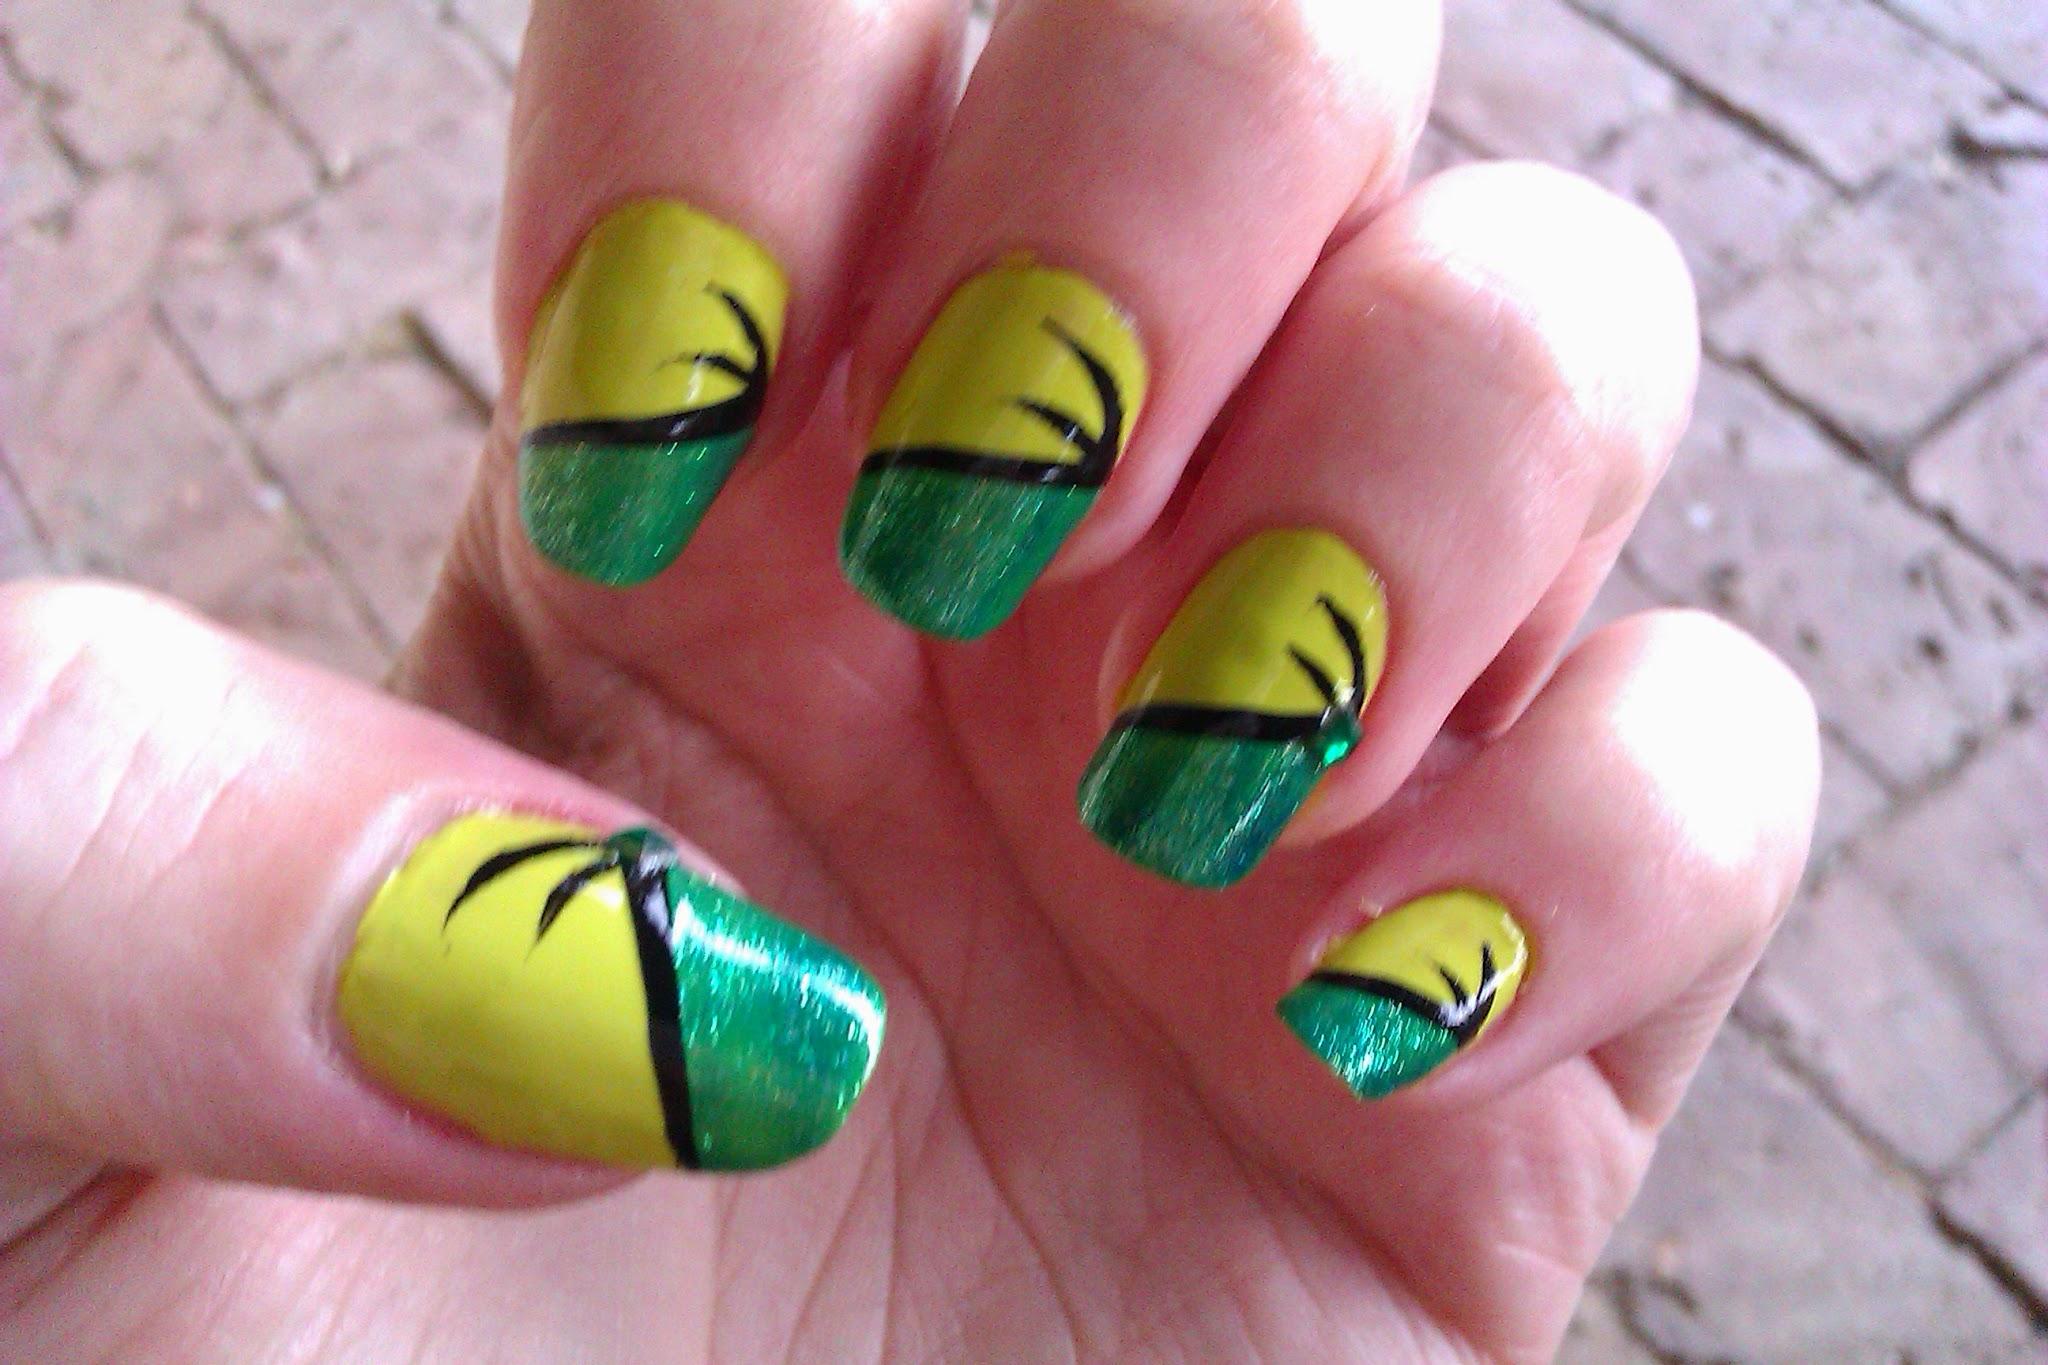 steps of nail art design gallery - nail art designs